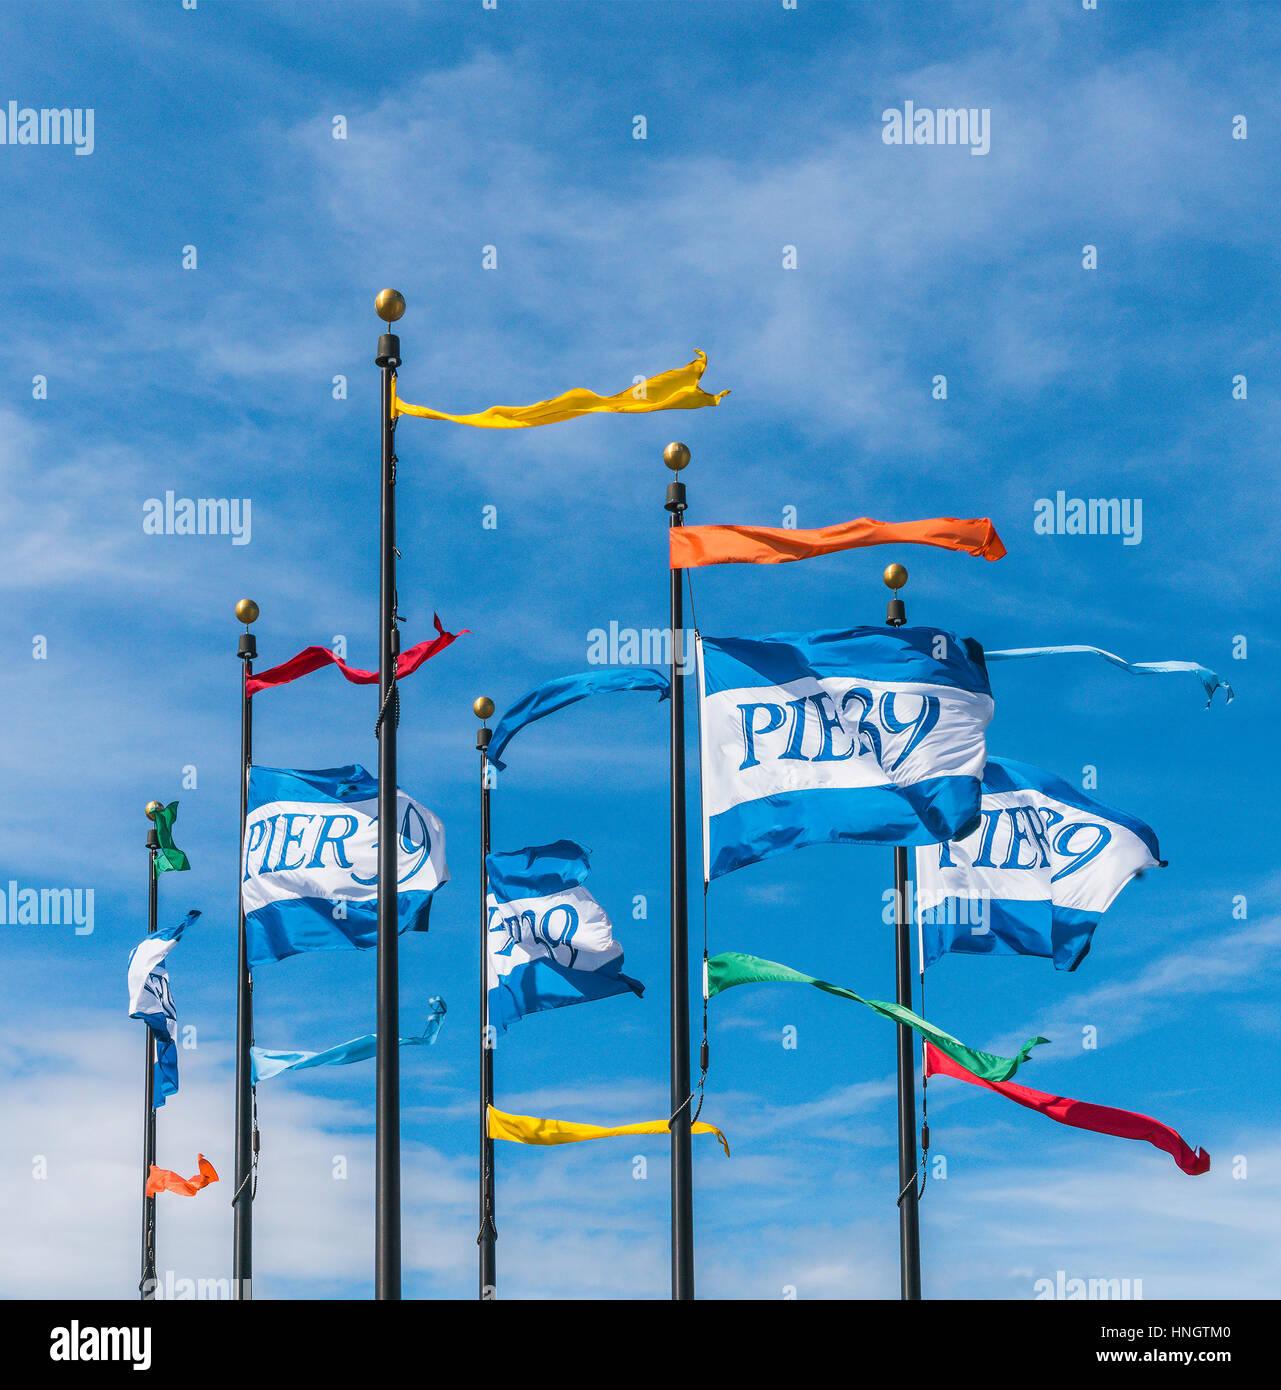 pier 39 flags on the blue sky,San francisco,California,usa. - Stock Image